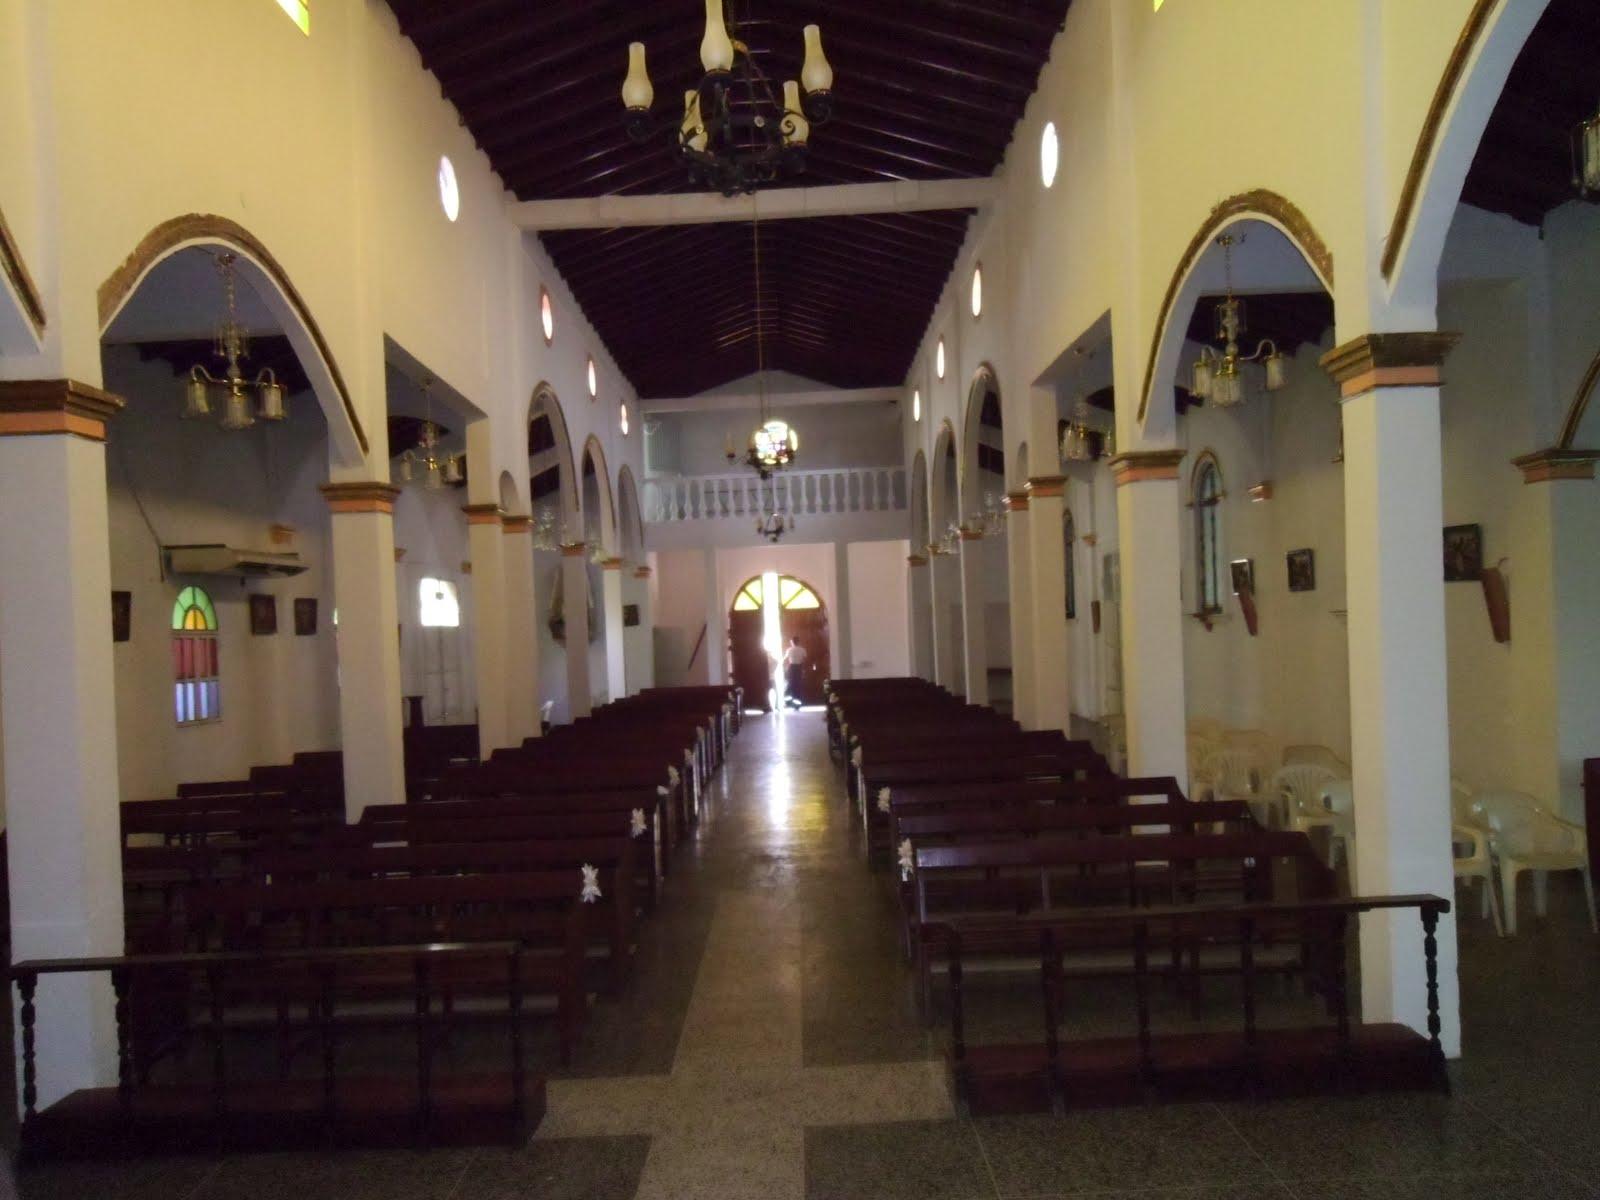 San Jose de Guanipa (VE) skank